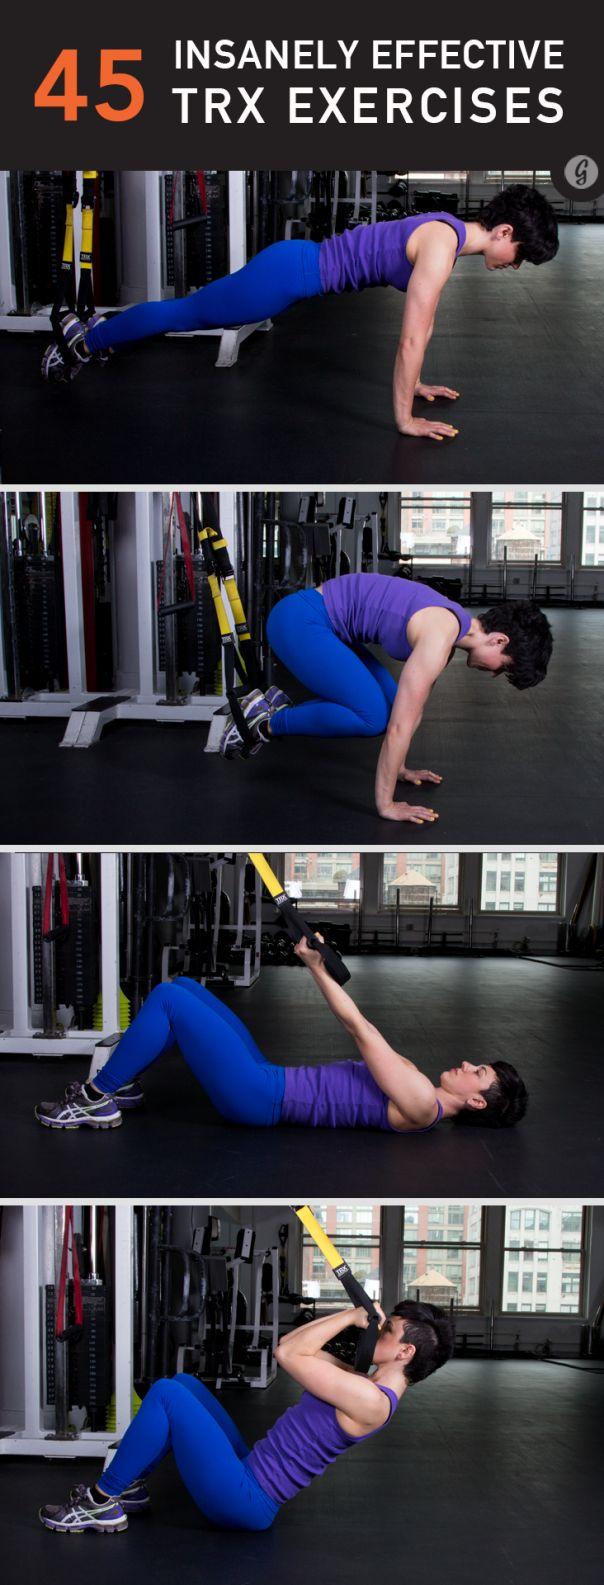 45 Insanely Effective TRX Exercises